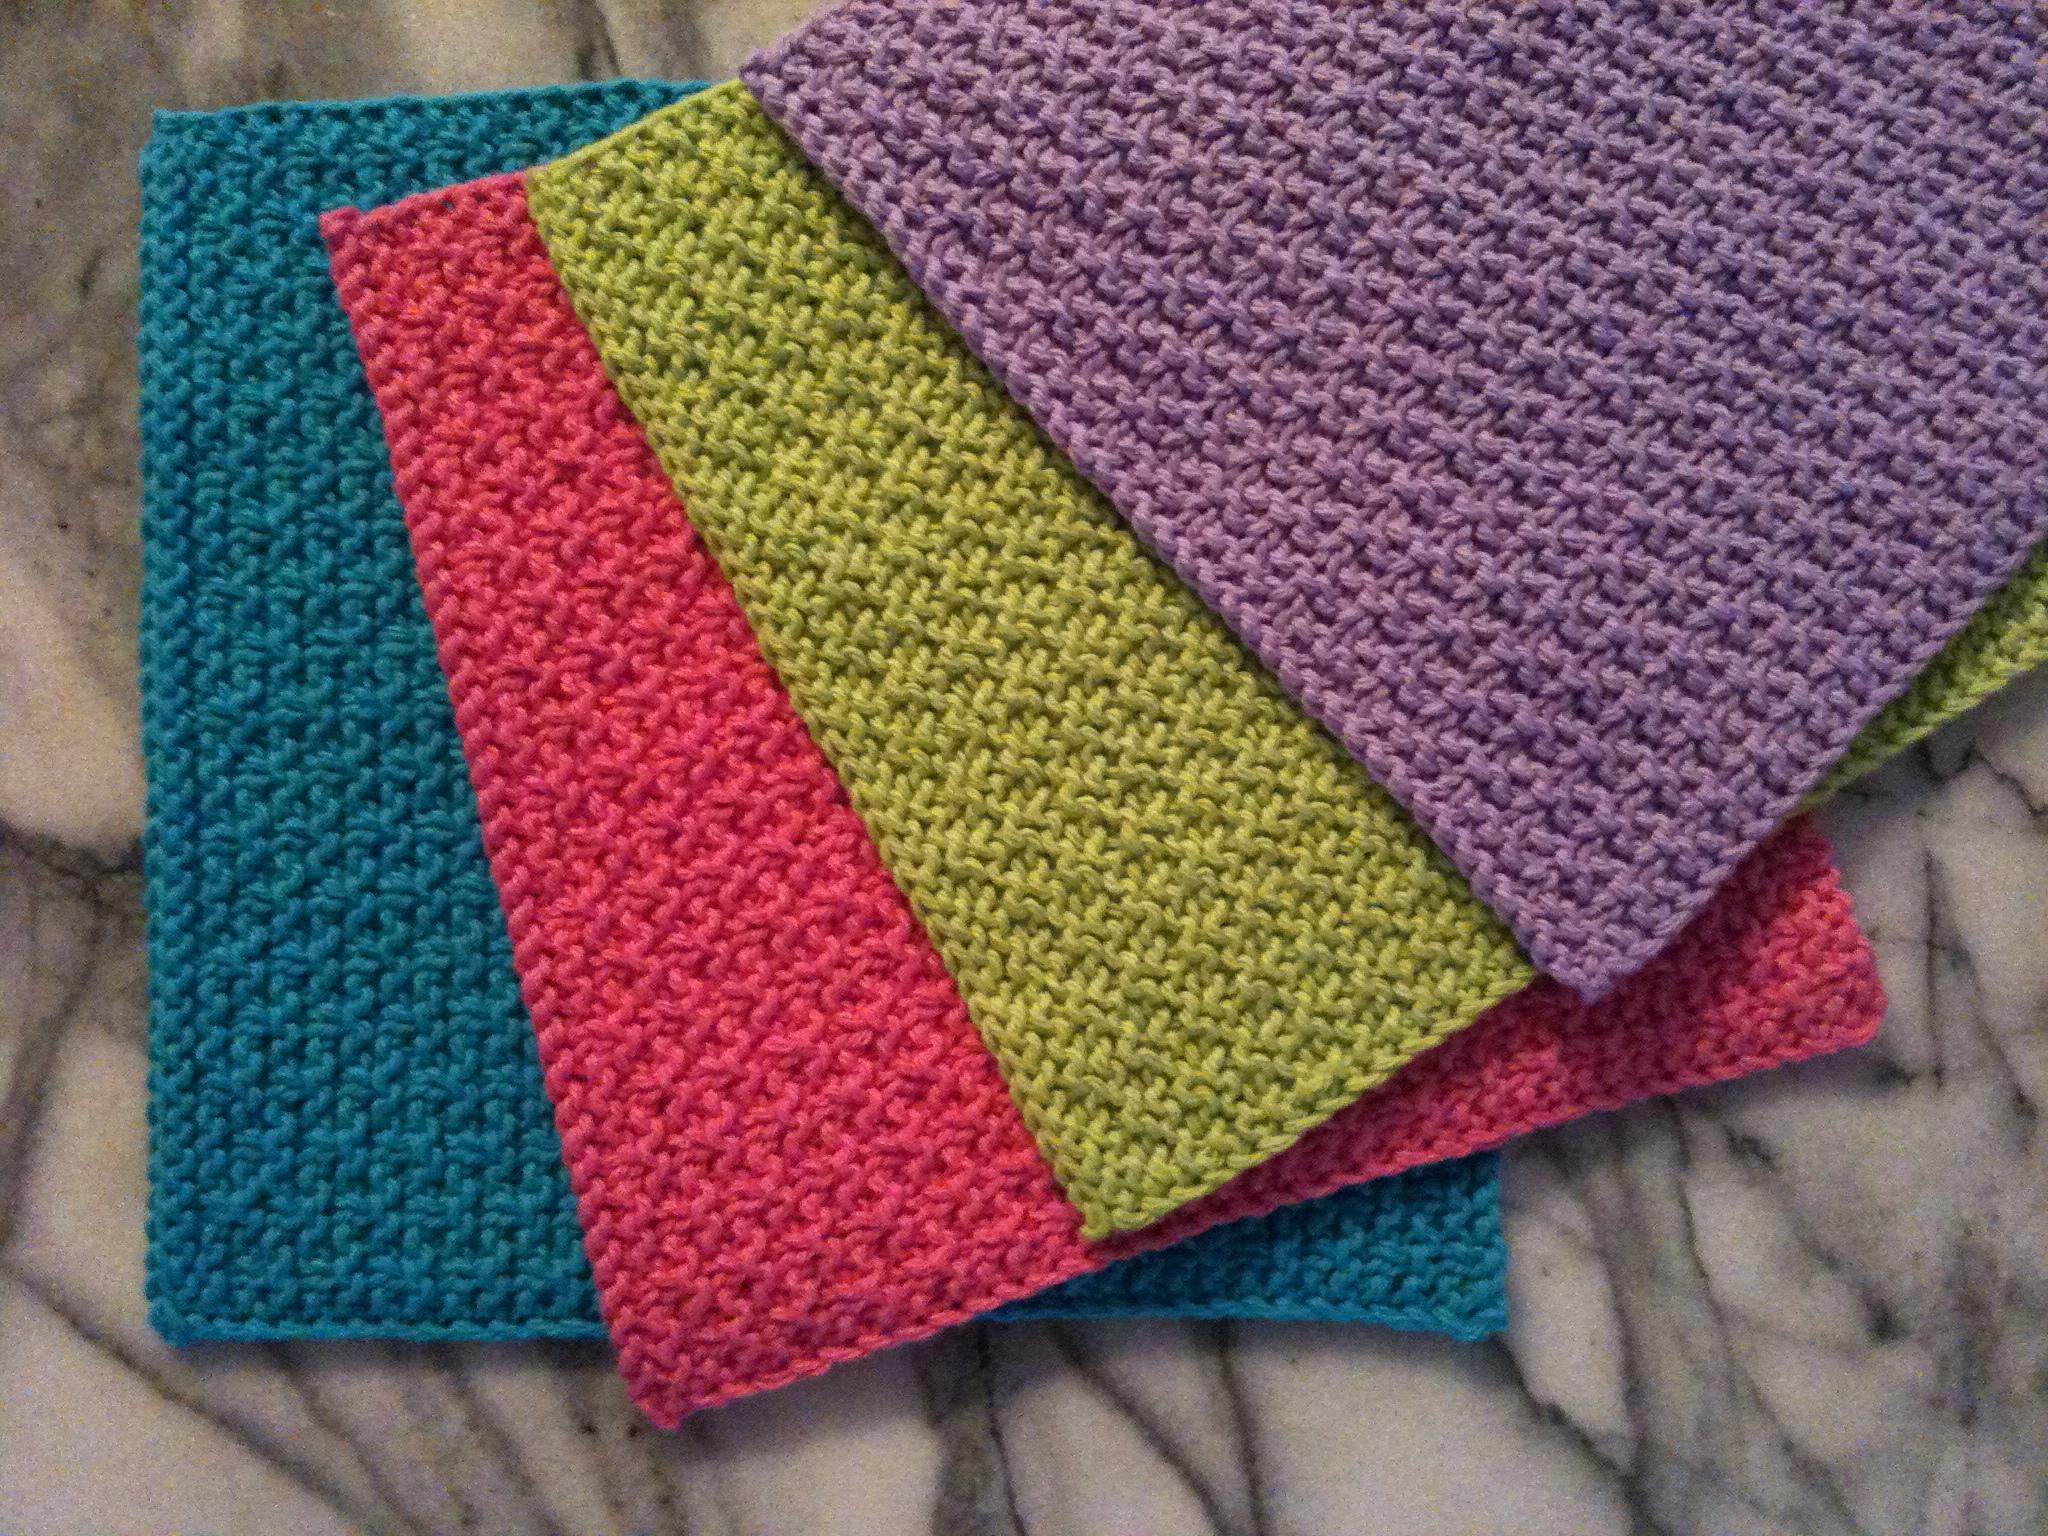 Washcloth Knitting Pattern Free Knitting Patterns Galore Snakes And Ladders Washcloth